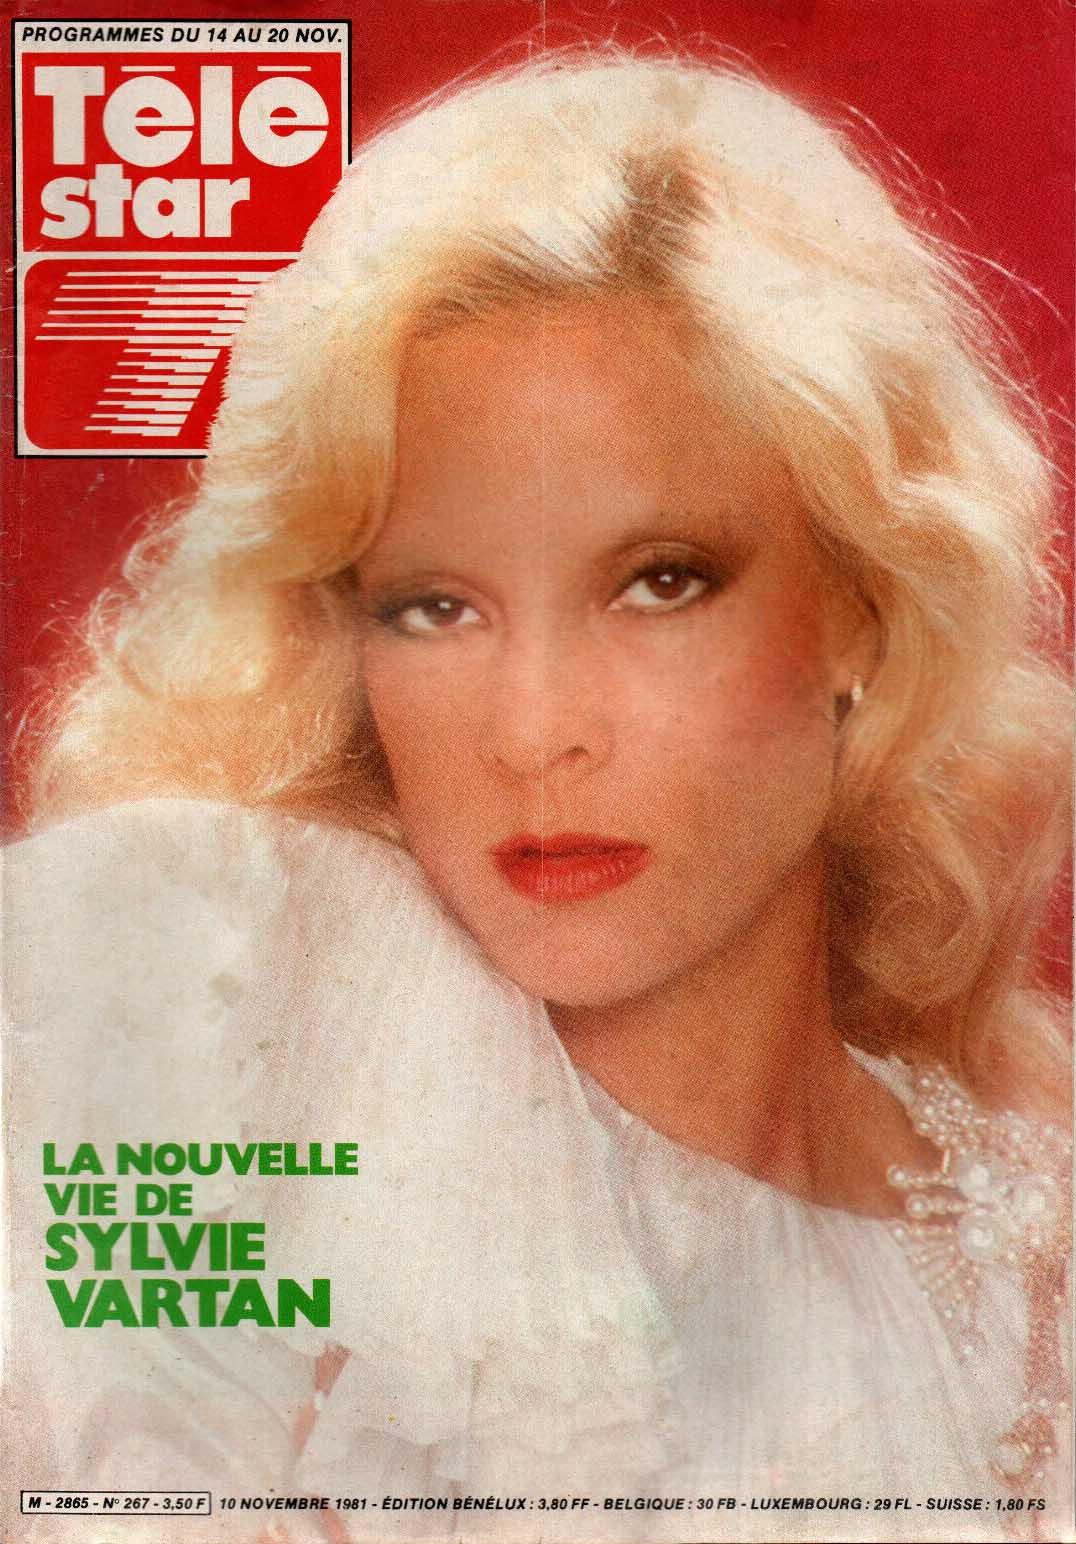 14 au 20 novembre 1981